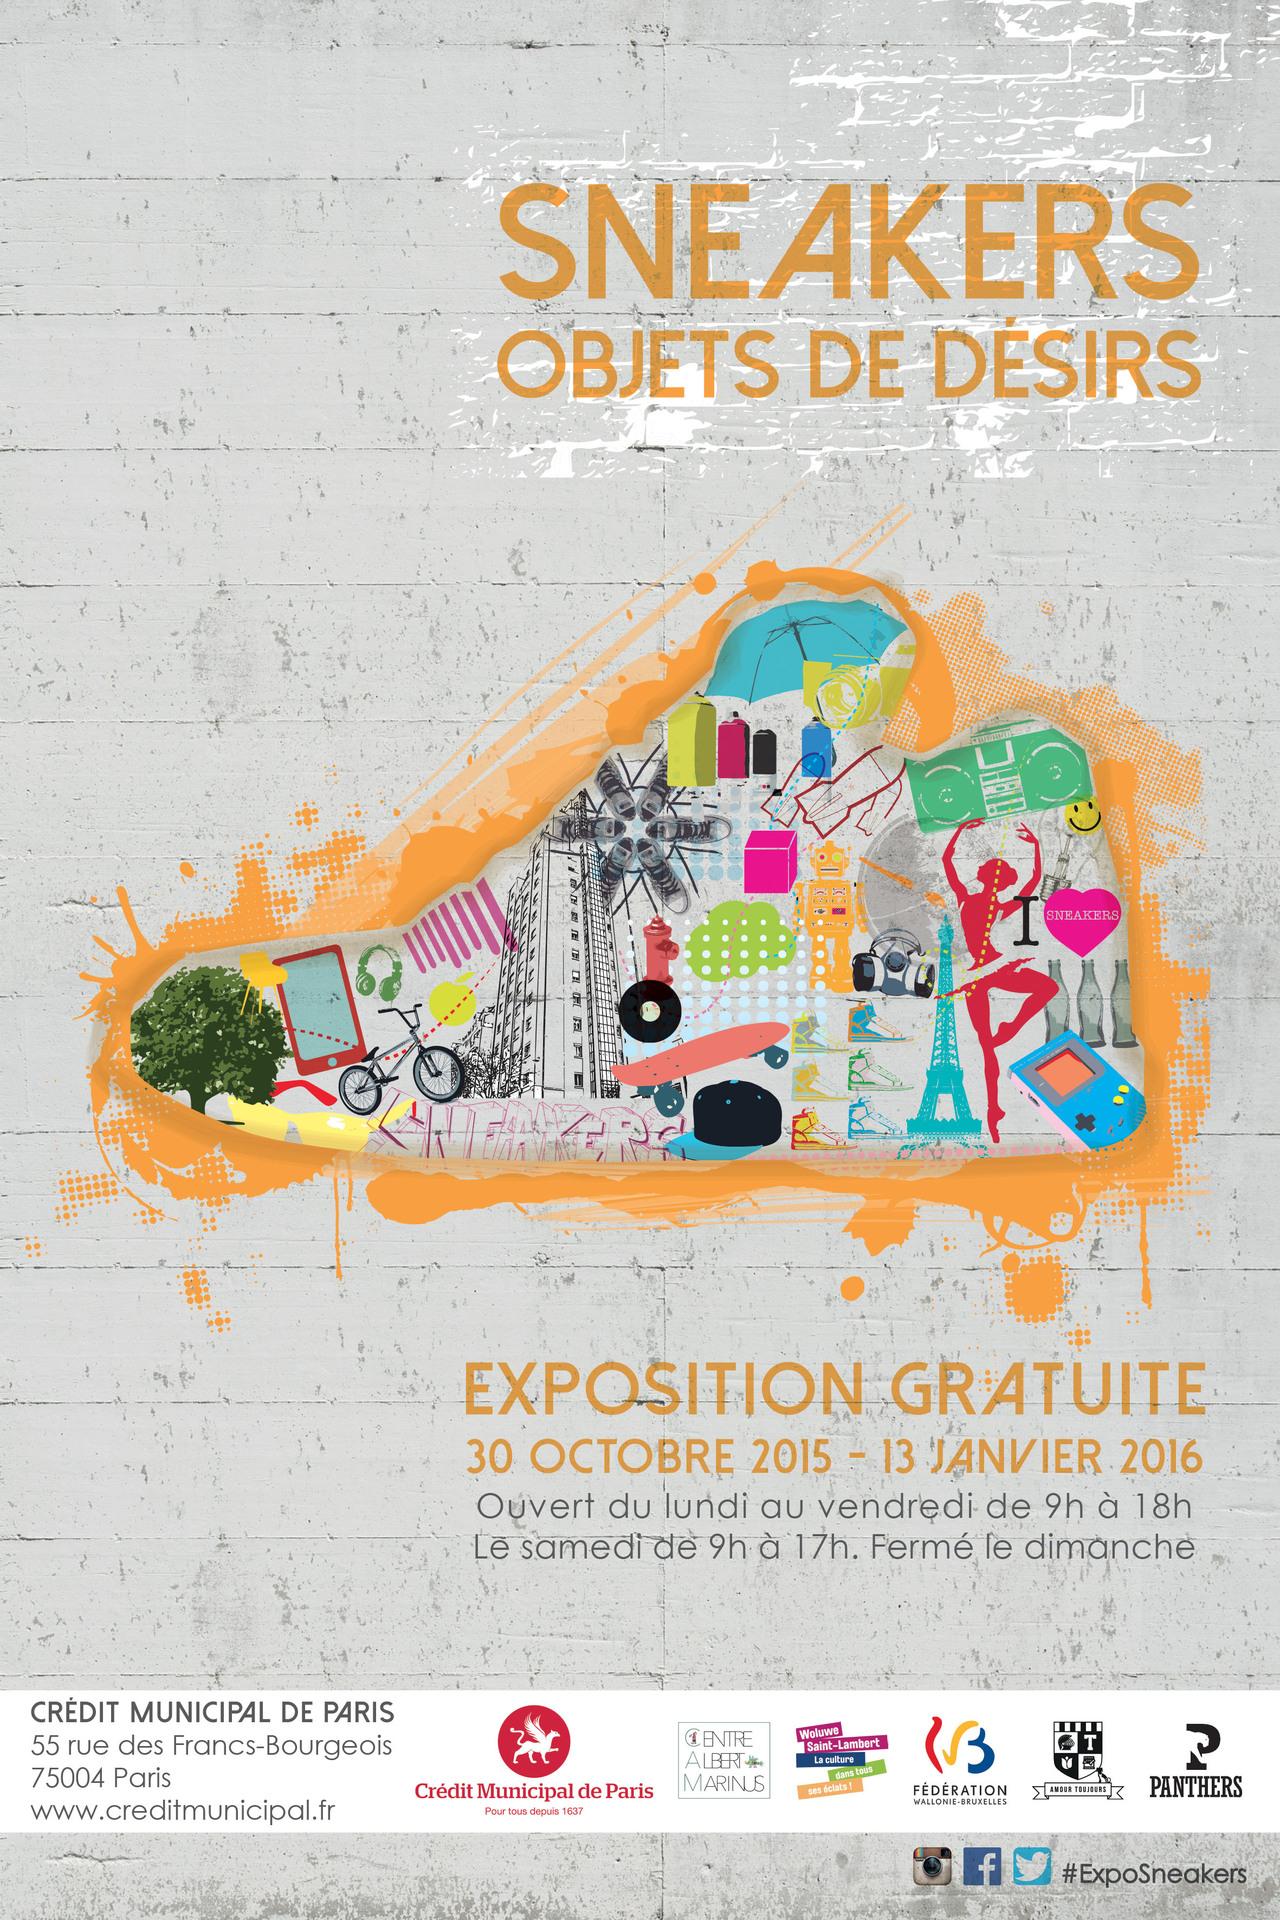 EXPO SNEAKERS OBJETS DE DESIR